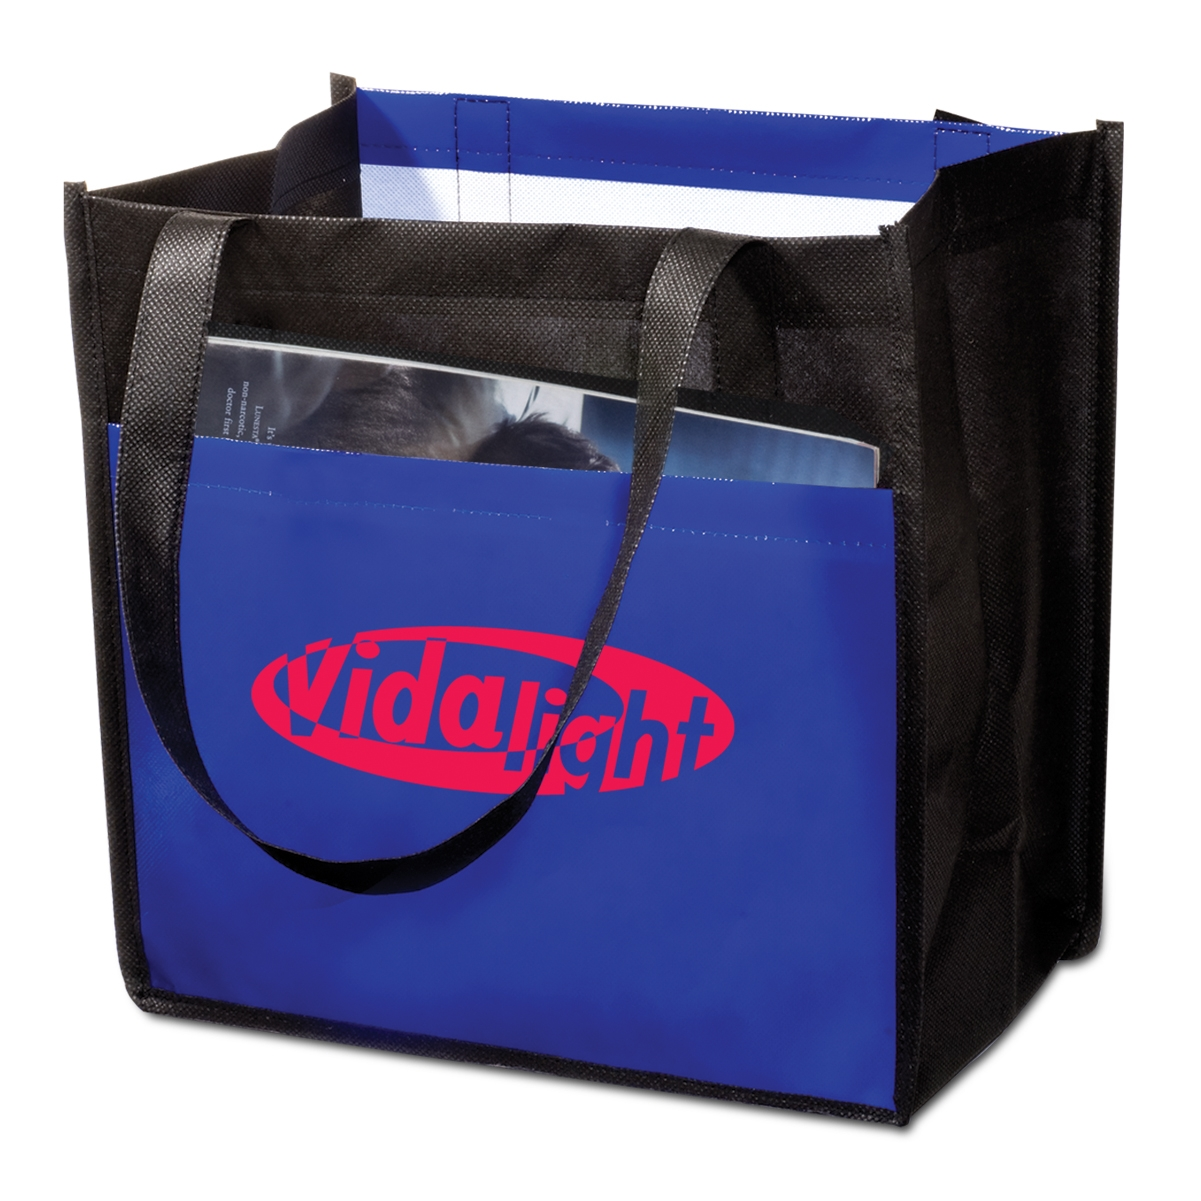 Laminated Enviro-Shopper Bag